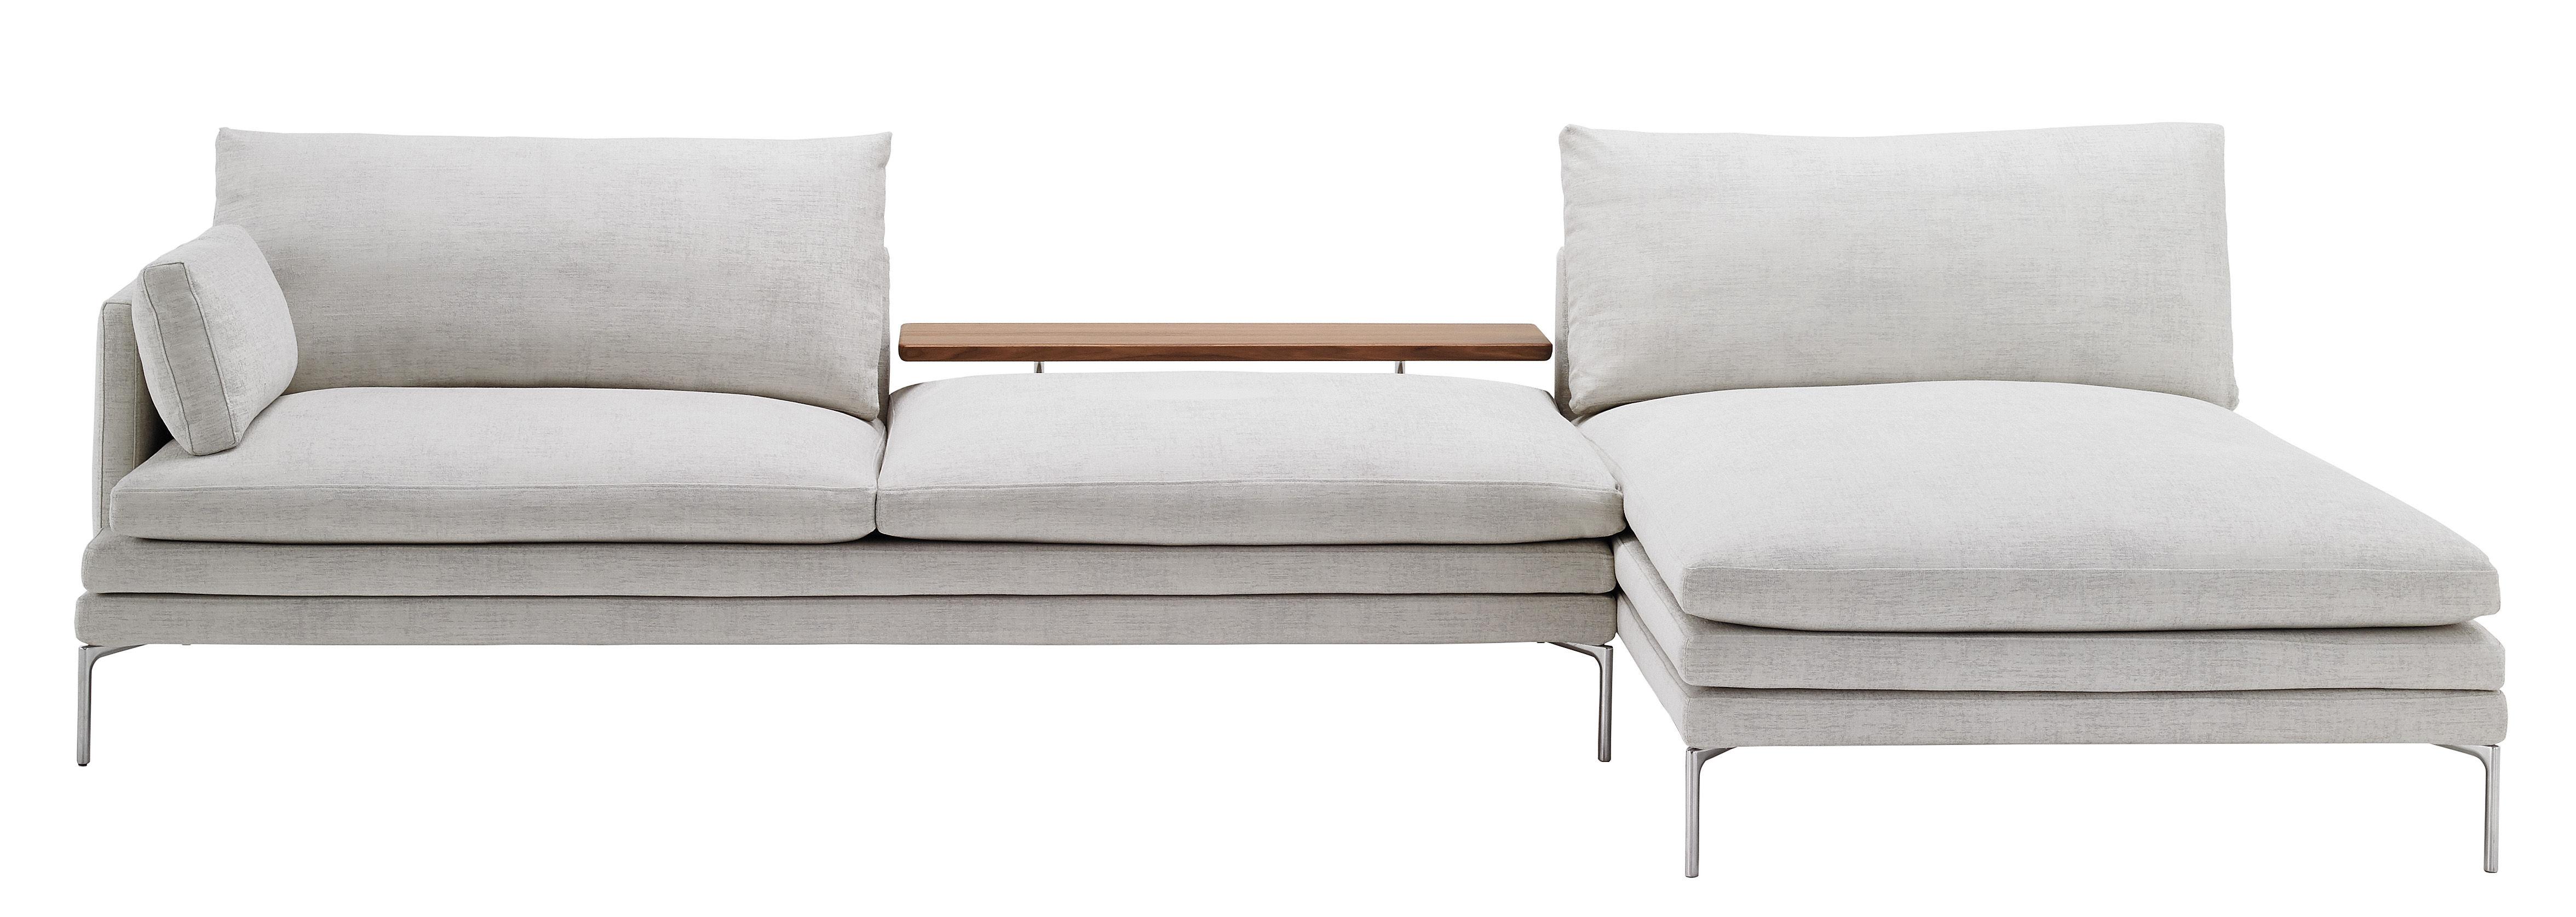 Furniture - Sofas - William Corner sofa - Fabric - L 328 cm - Right angle by Zanotta - Light grey / Walnut - Aluminium, Fabric, Polyurethane, Solid walnut, Steel